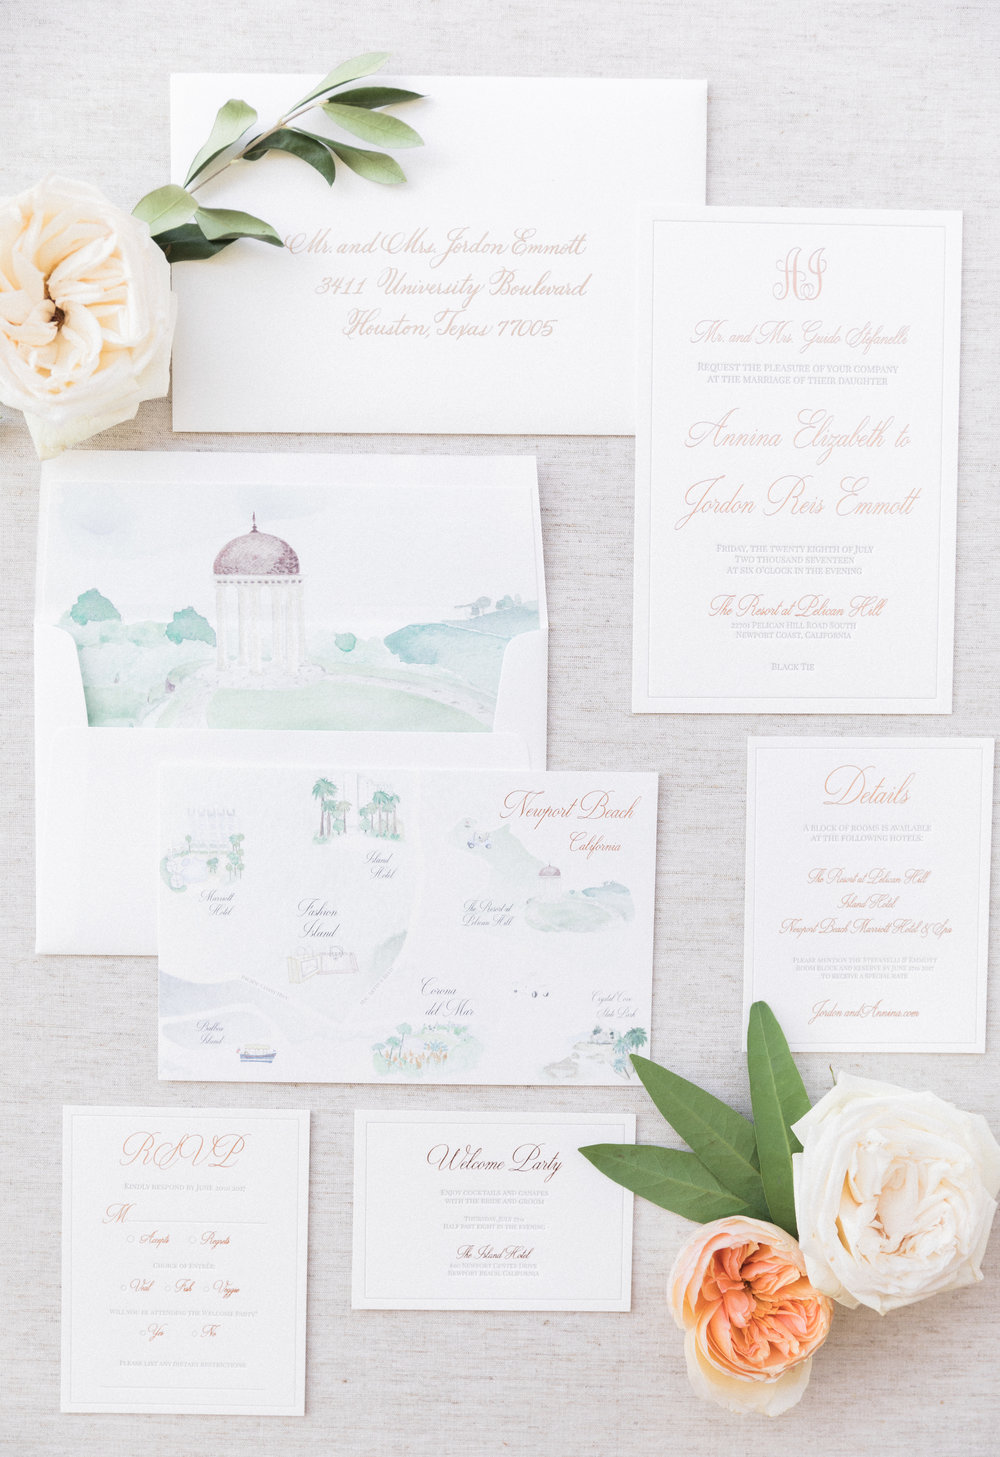 Pelican Hill Wedding Invitation Suite by Vie de Vic Fine Illustration & Stationery | Photo: Brandon Kidd Photo